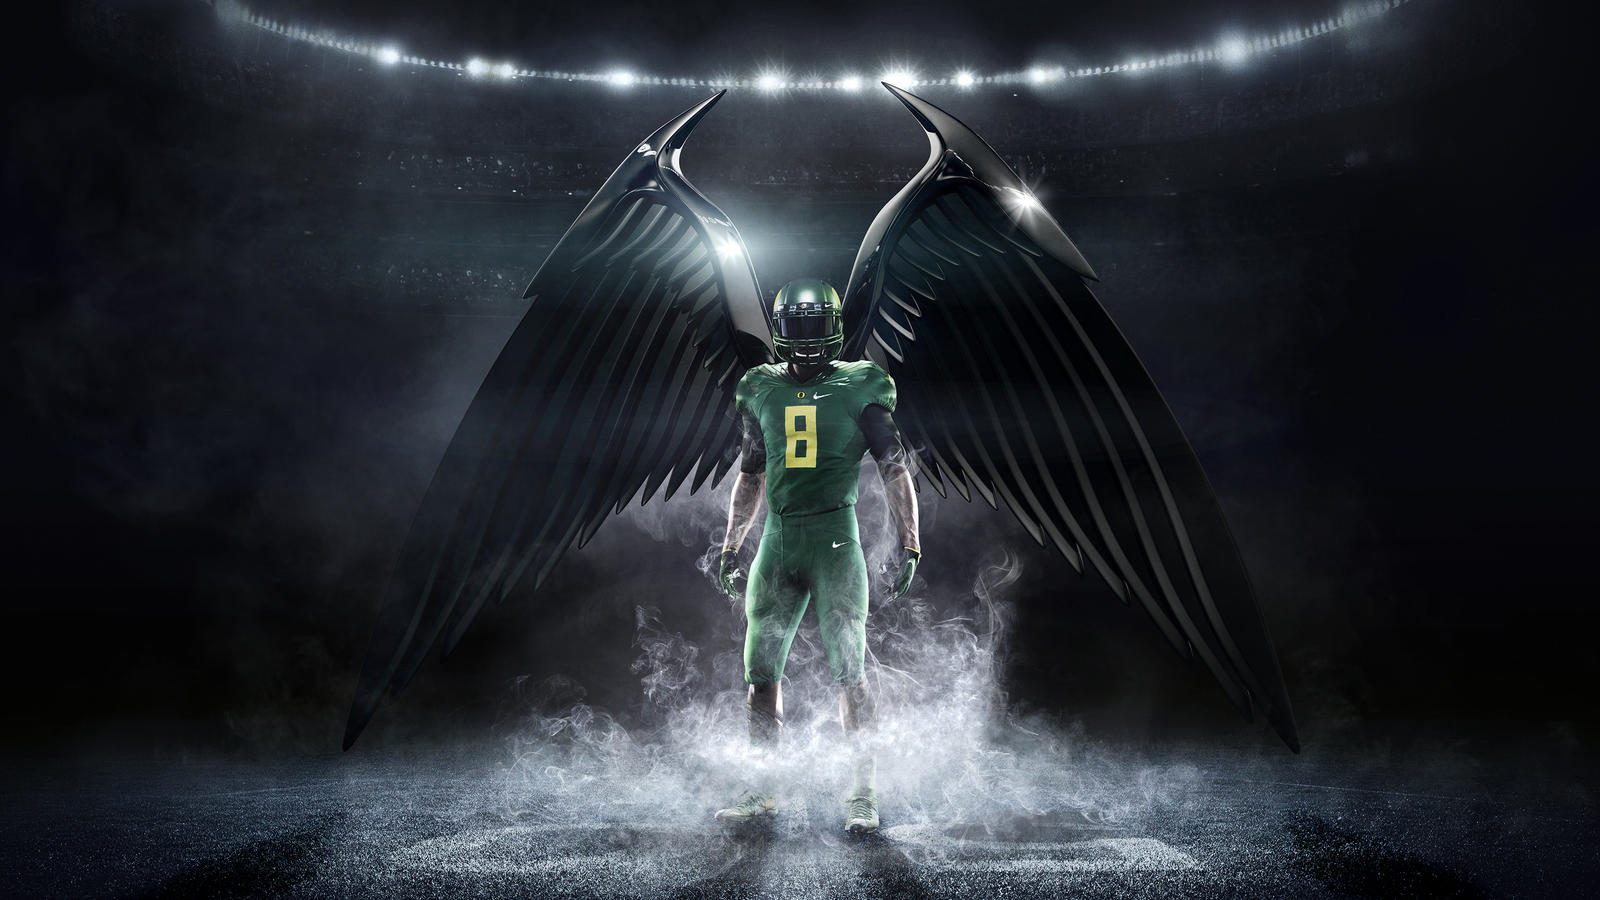 Hd Oregon Ducks Wallpaper Four Nike Sponsored Teams Battle For College Football